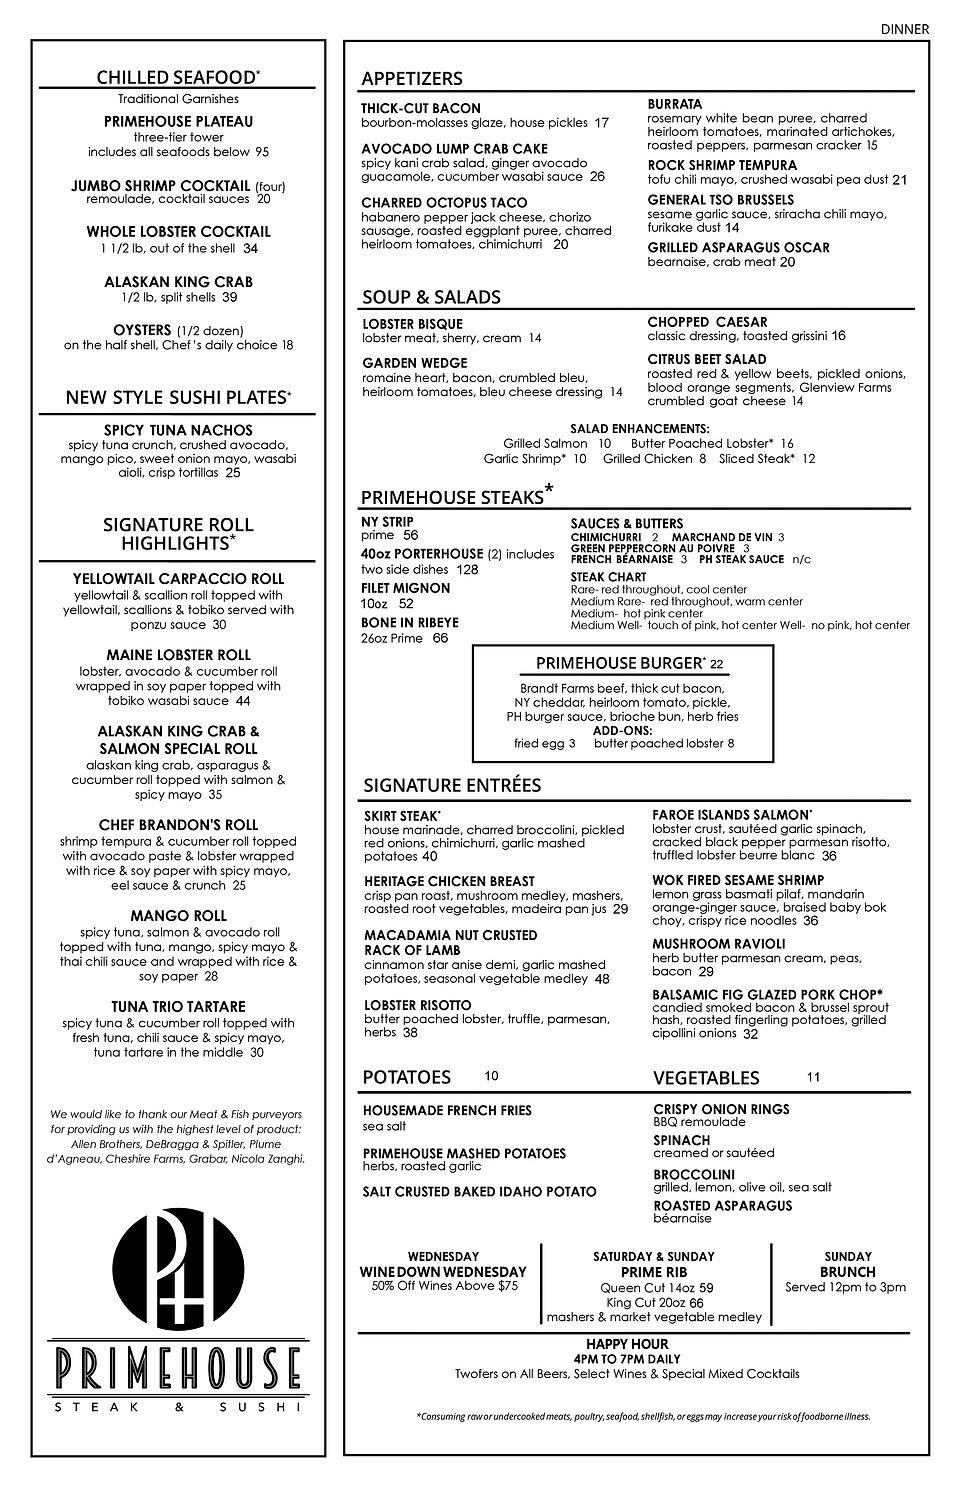 PH Dinner Menu 6.3.21.jpg